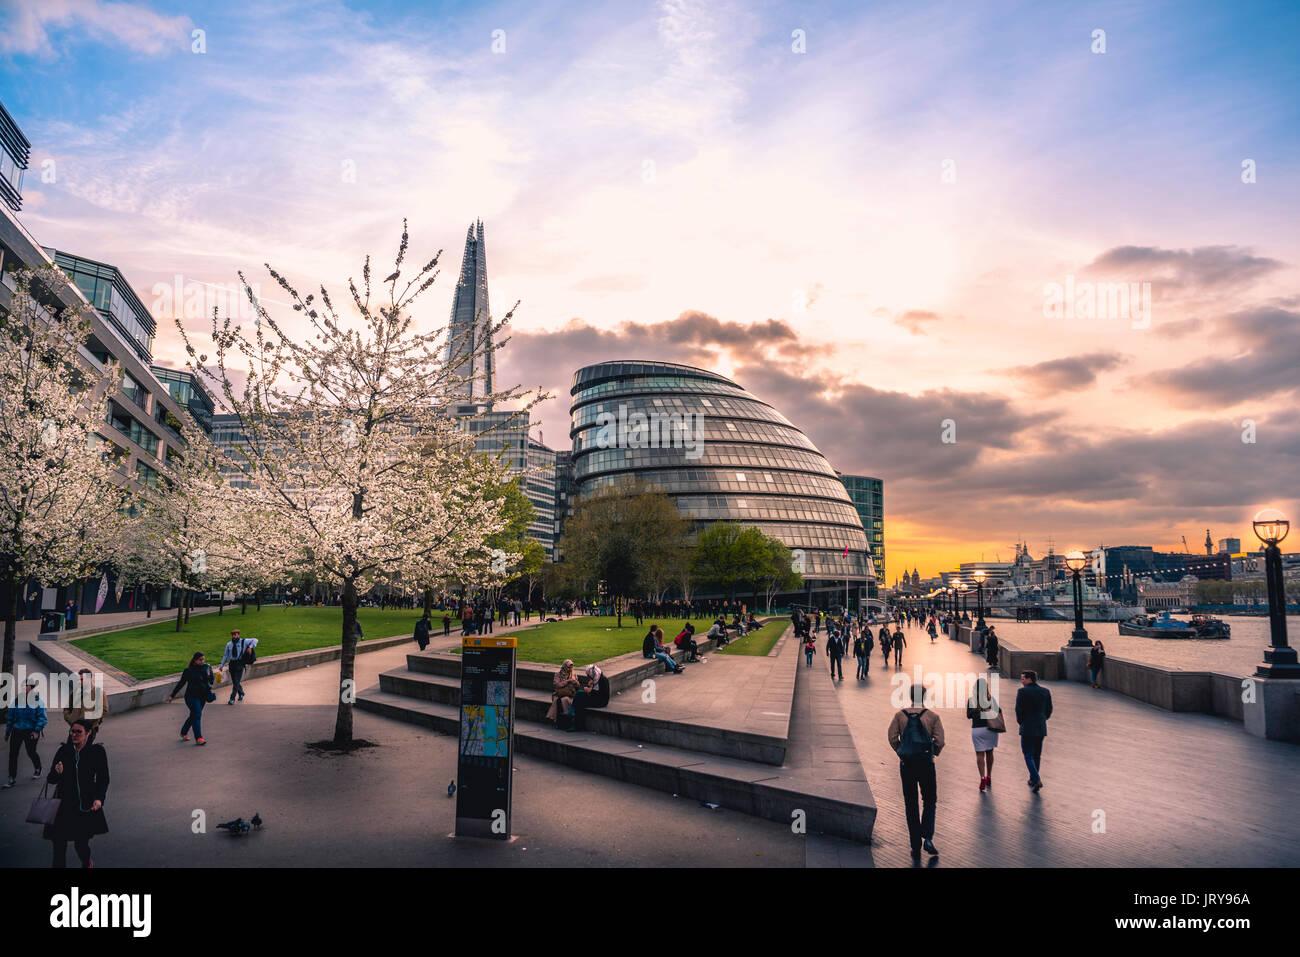 Promenade on the Thames, Potters Fields Park, Skyline, London City Hall, The Shard, at sunset, Southwark, London, England - Stock Image